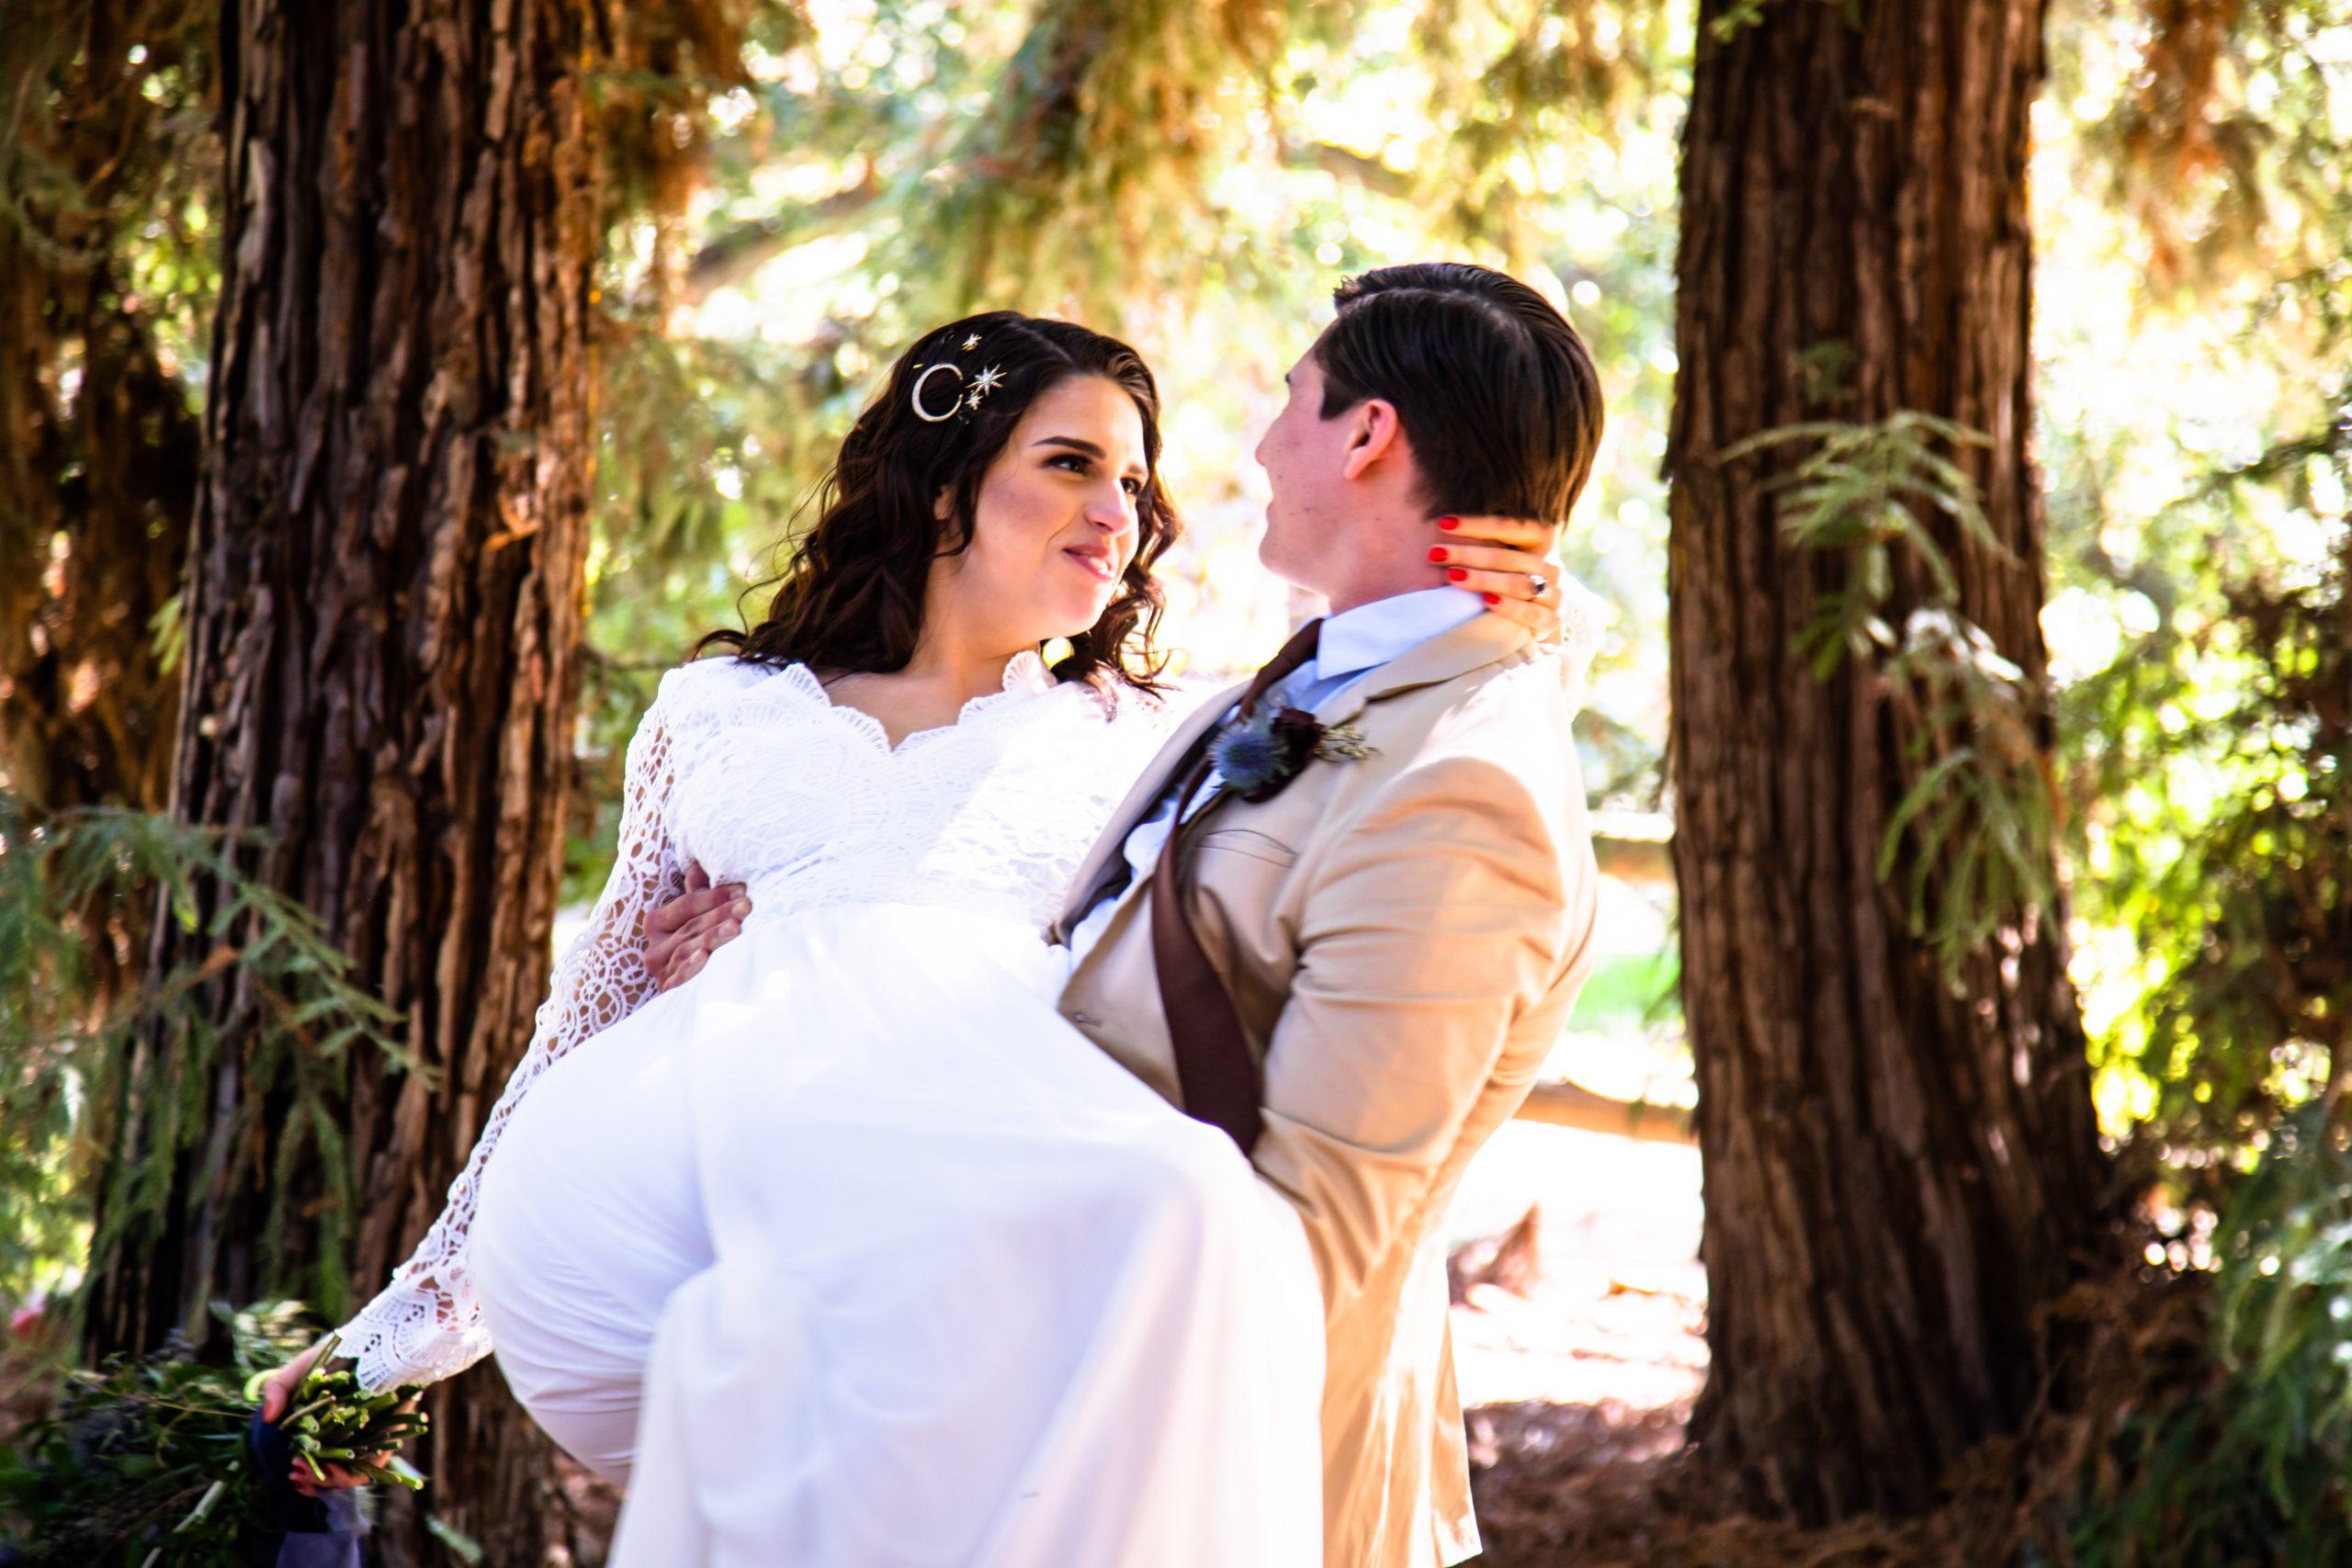 los angeles elopement, offbeat bride, micro wedding los angeles, california botanic garden elopement